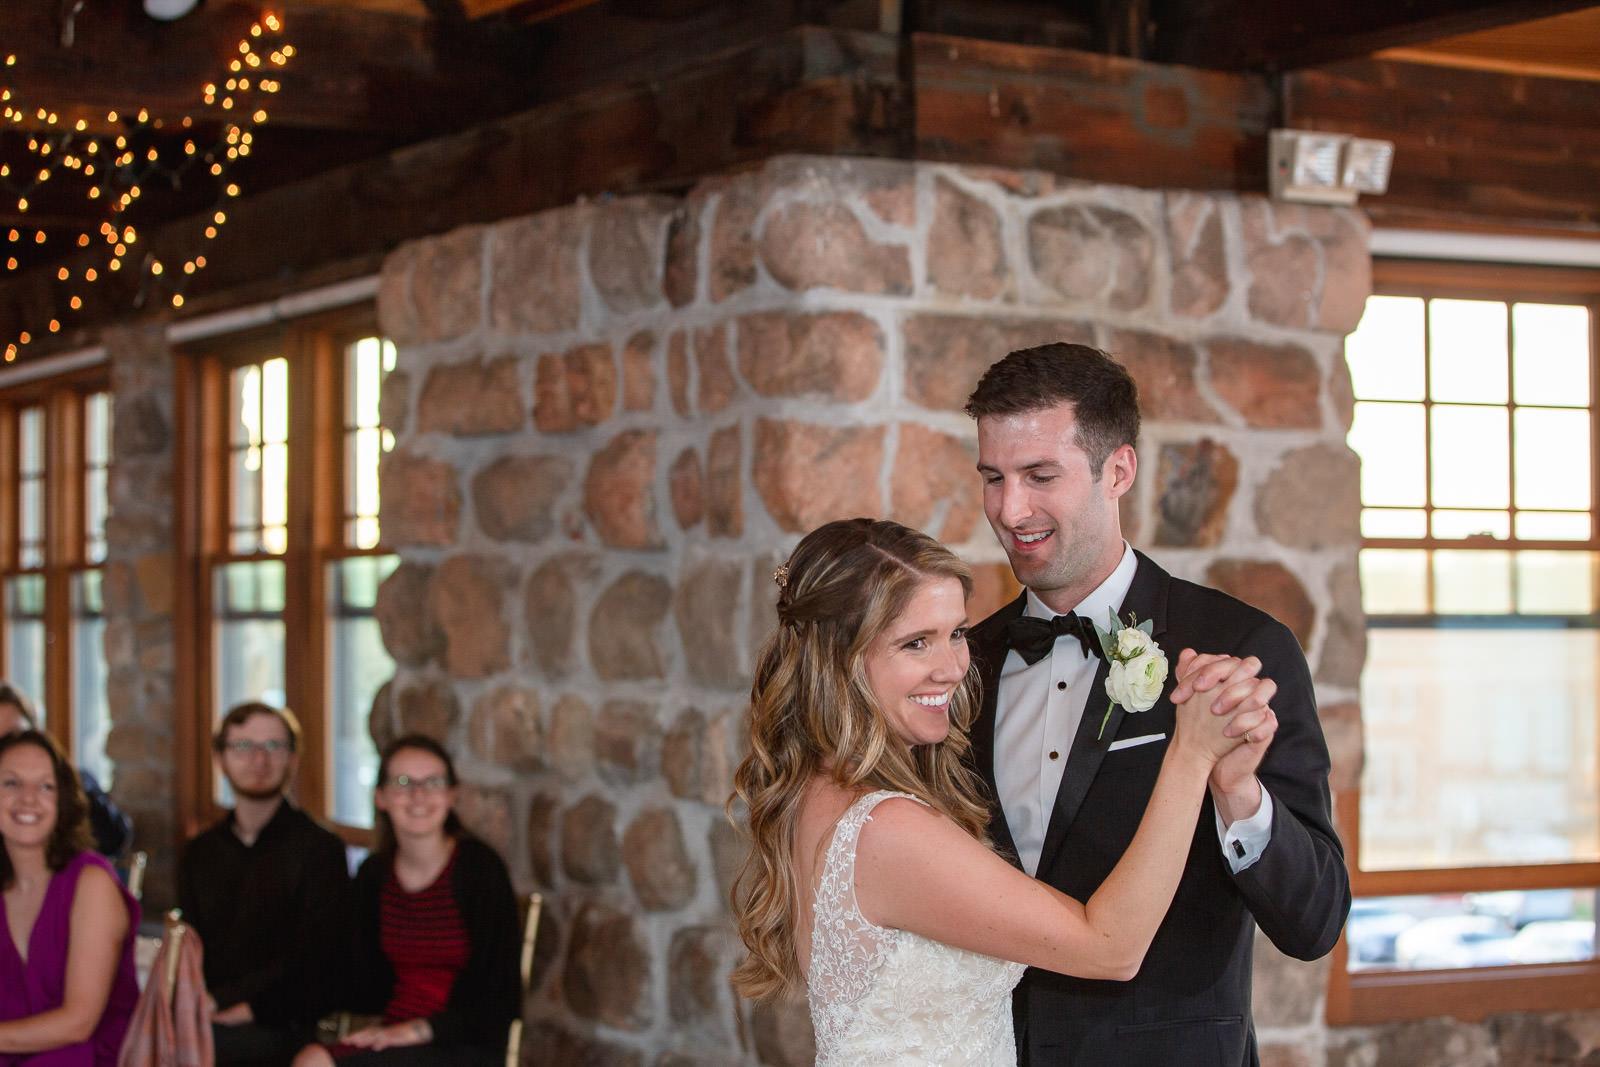 Wedding, Narragansett Towers, The Towers, Narragansett, Rhode Island, RI, Tracy Jenkins photography, RI wedding photographer, Rhode Island wedding photographer, first dance, wedding reception